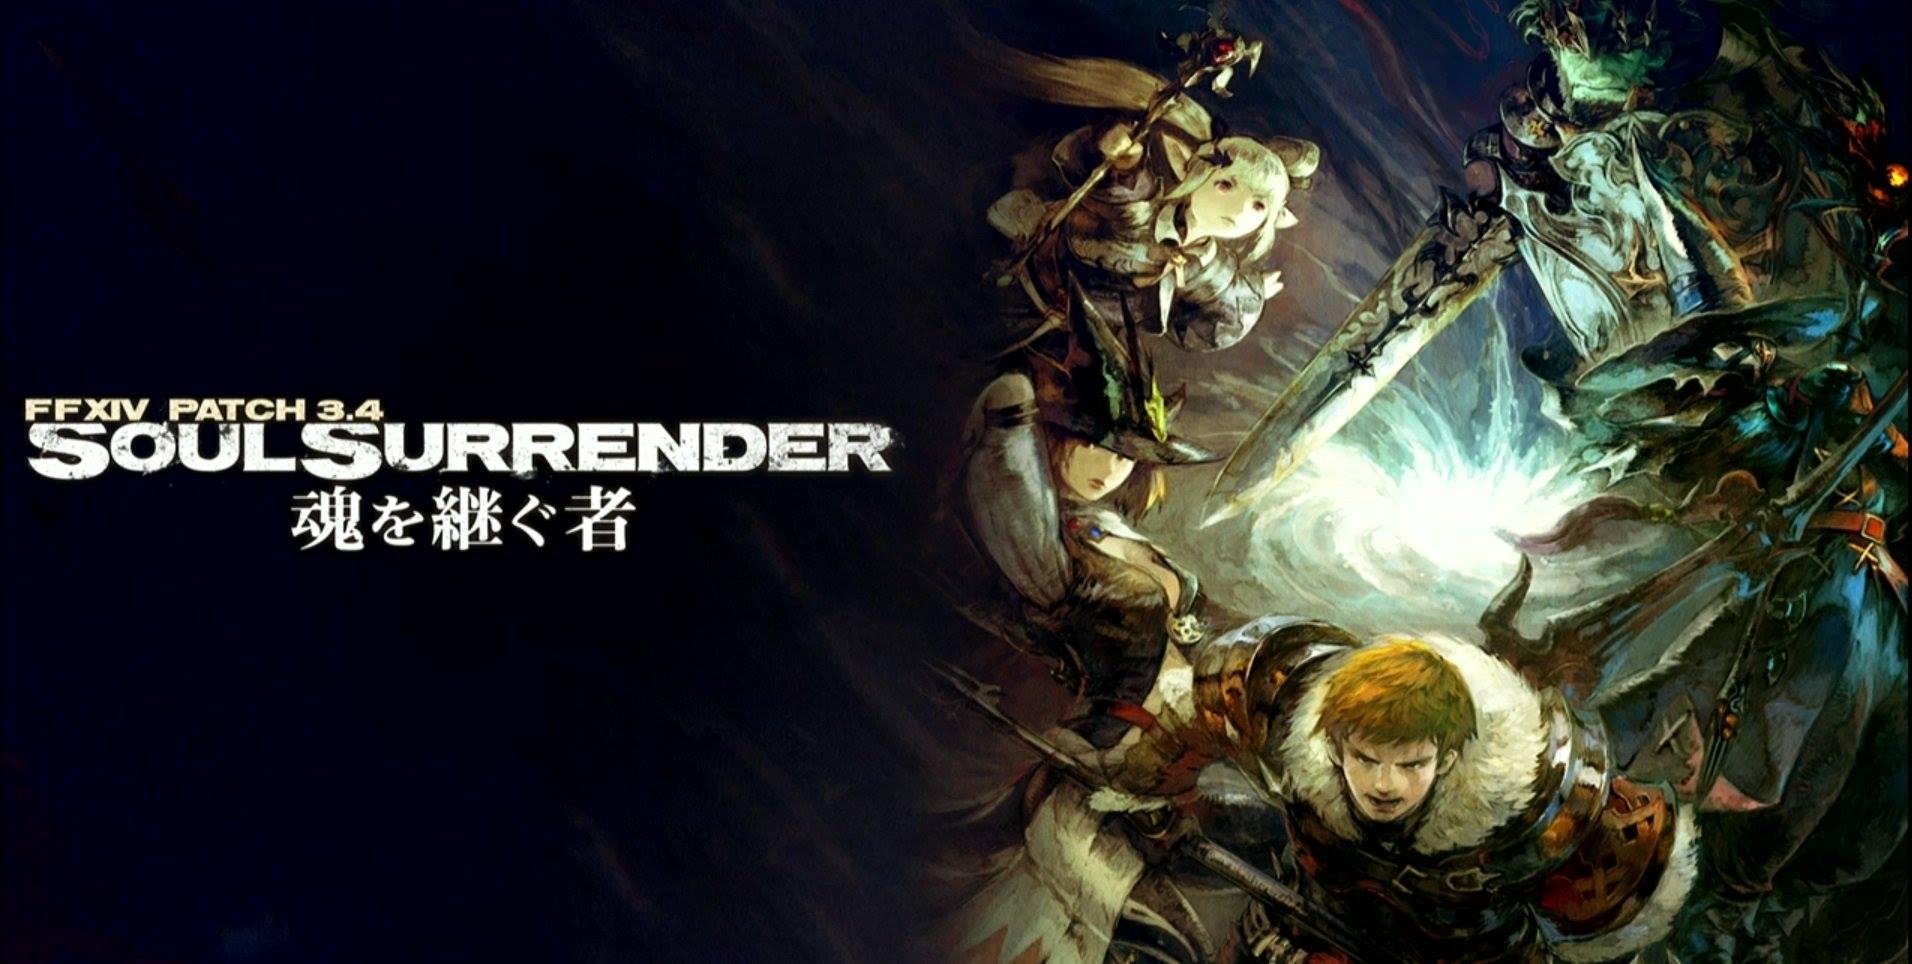 Final Fantasy XIV - Patch 3.4 - Soul Surrender